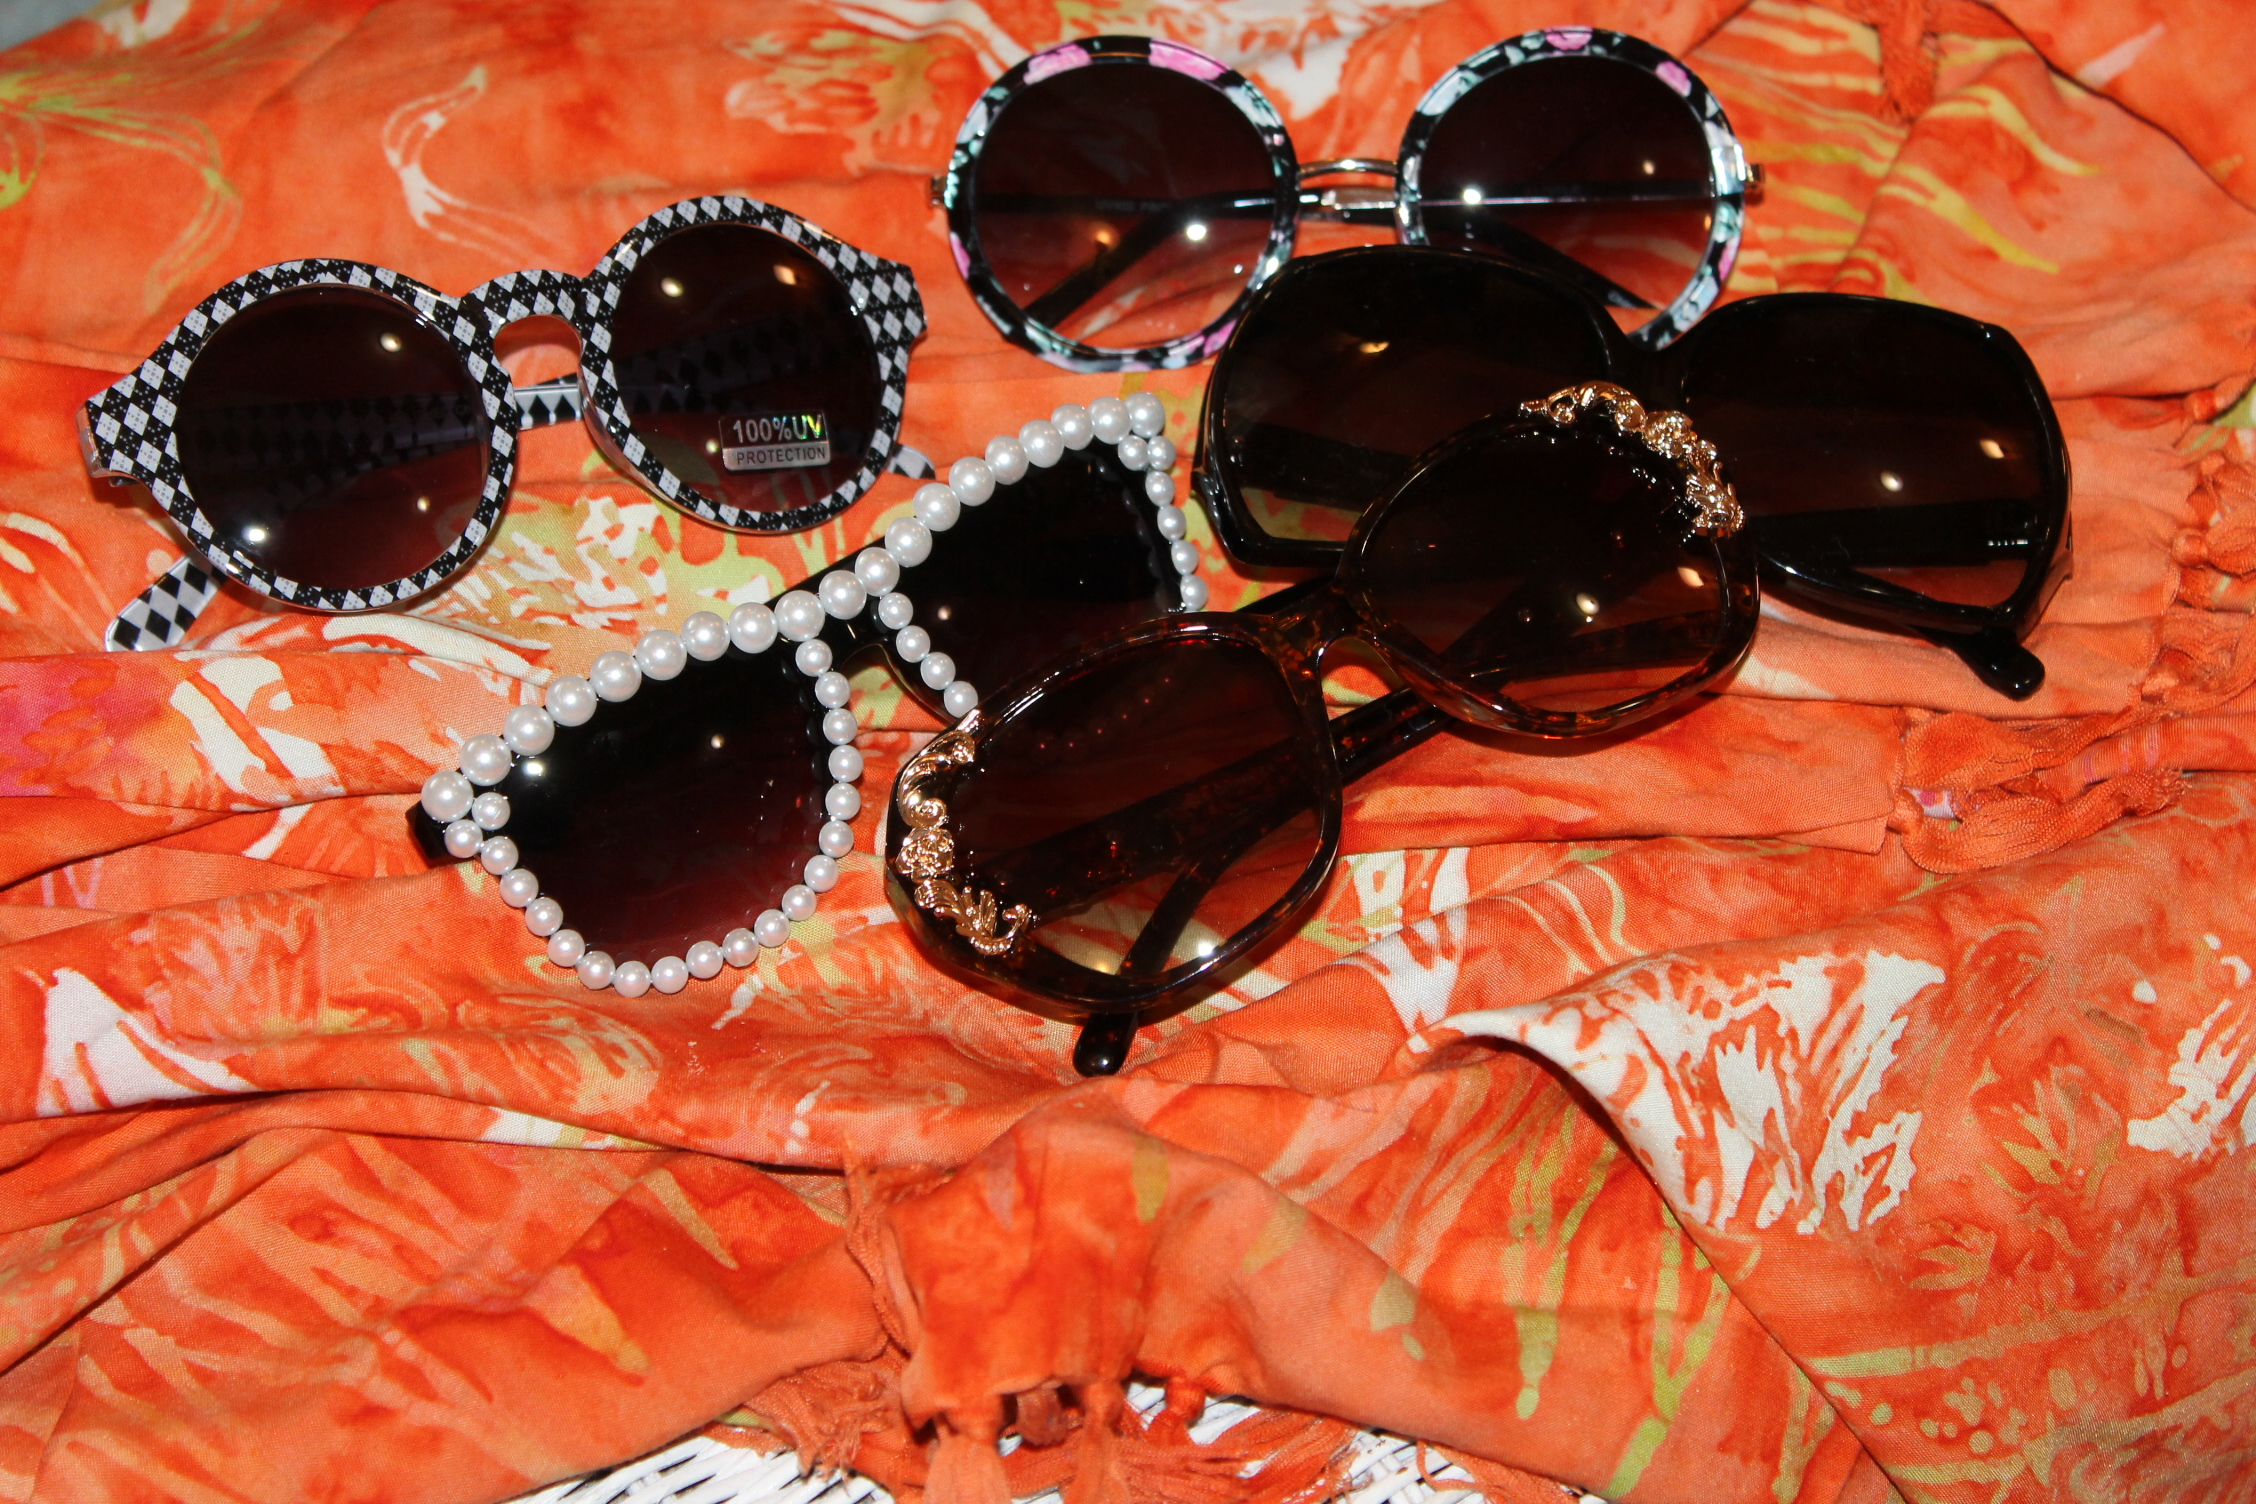 FREYRS retro style sunglasses #freyrseyewear